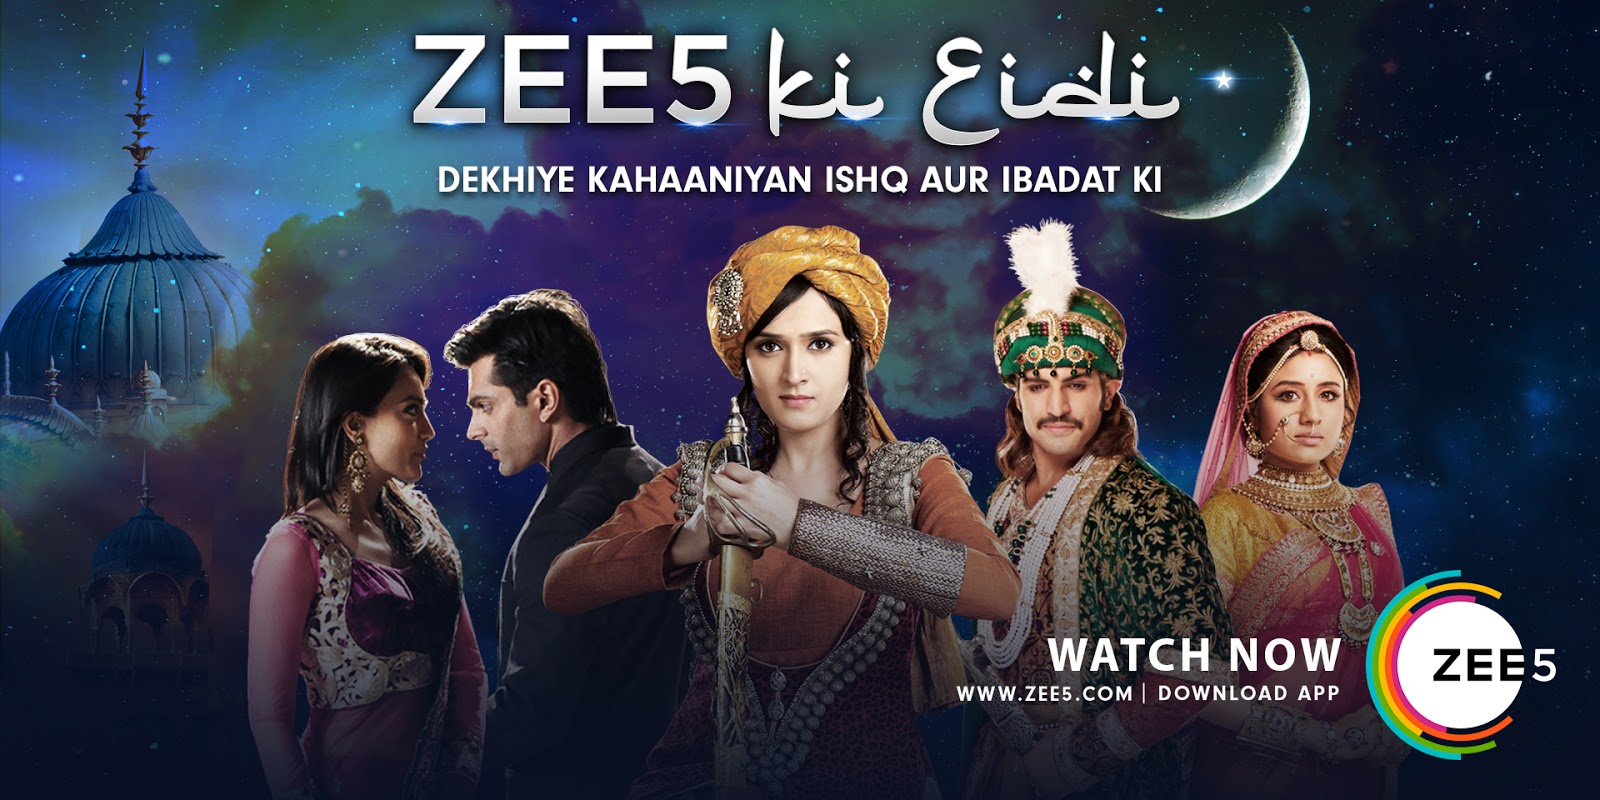 Zee5 Subscription Offer